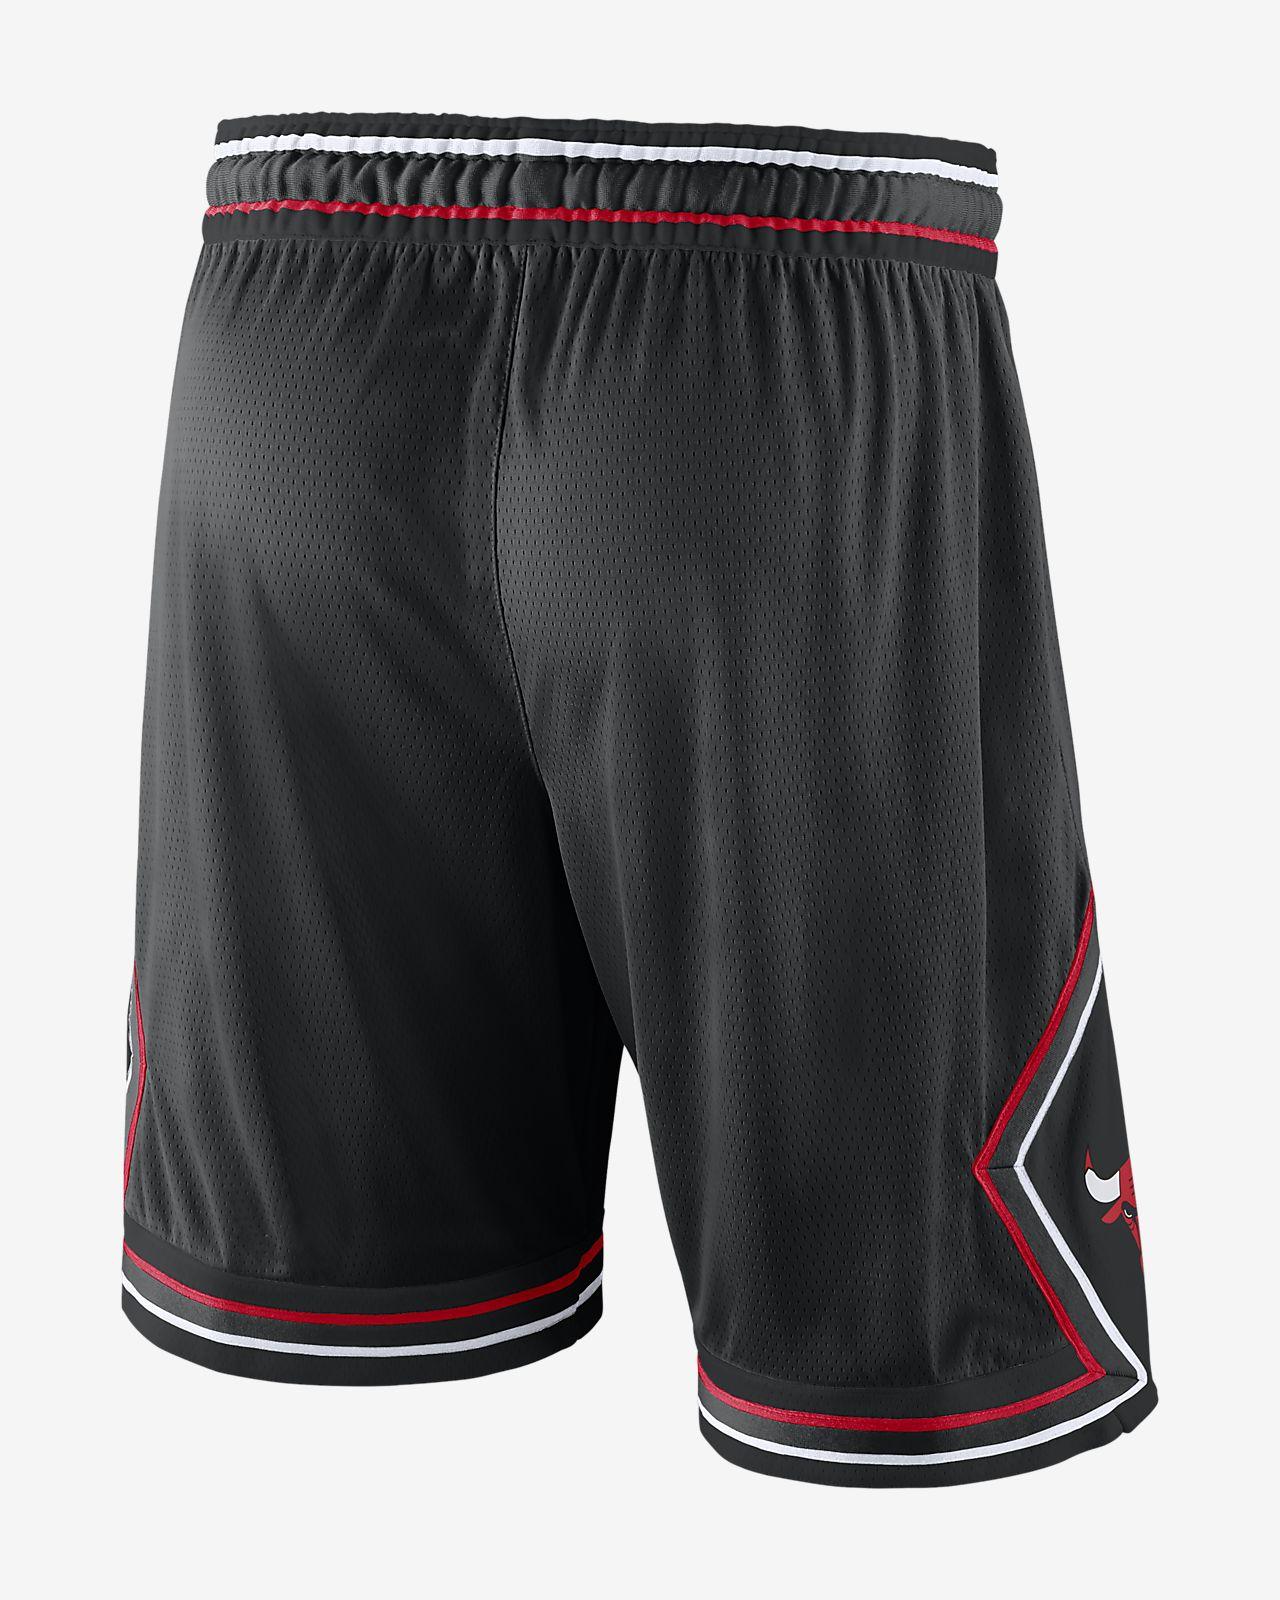 ... Chicago Bulls Nike Statement Edition Swingman Men's NBA Shorts